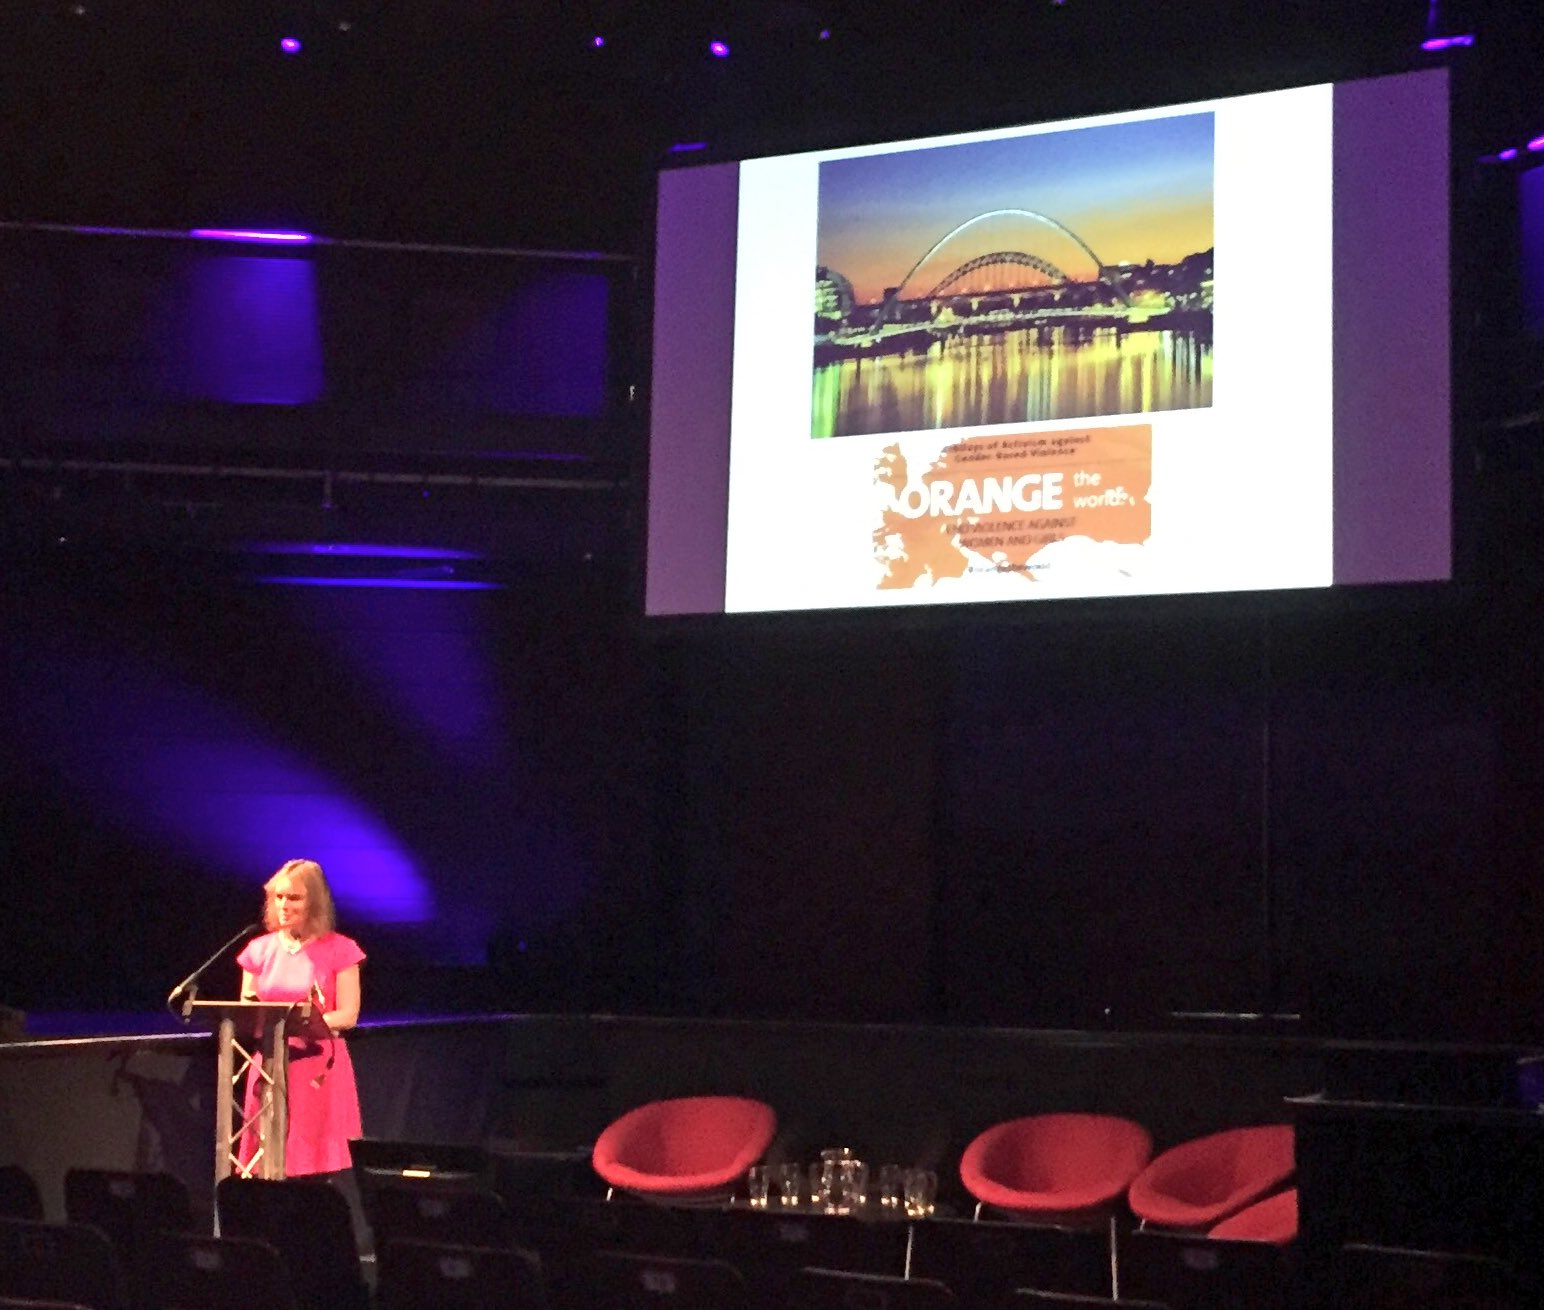 Professor Fionnuala McAuliffe begins her #RCOGNTC presentation by marking #16Days #orangetheworld https://t.co/5wwnMkJupK